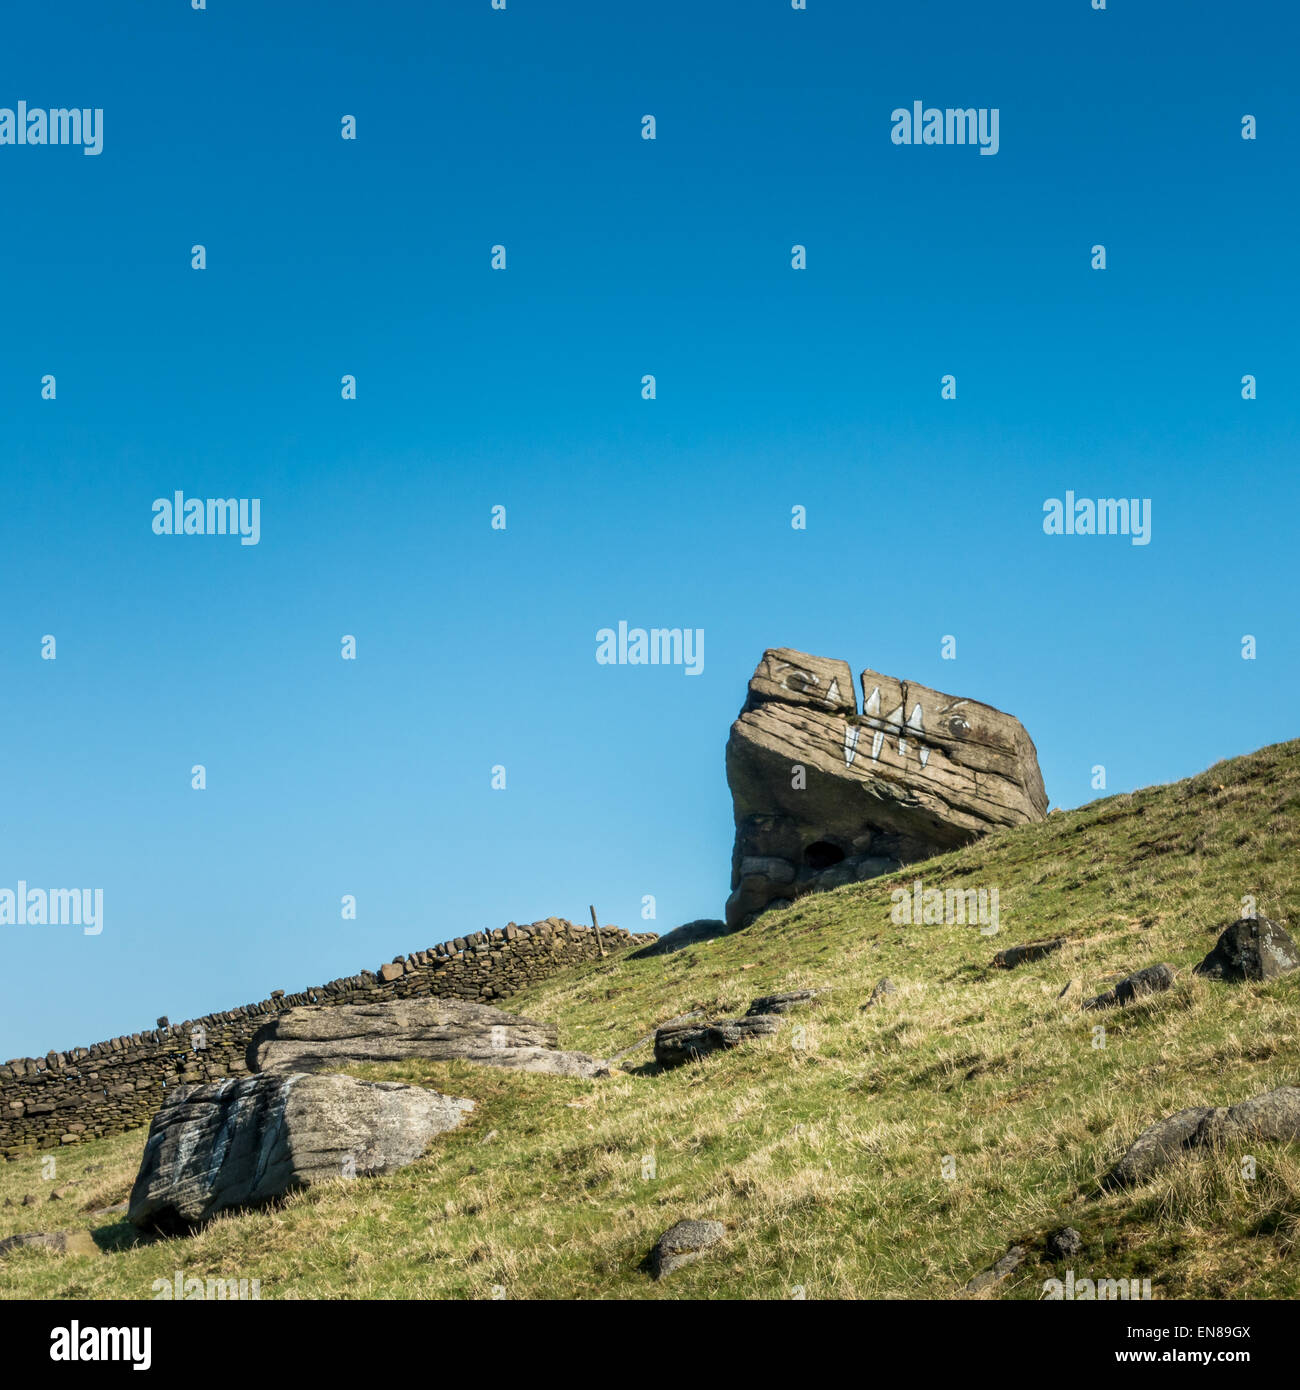 Rock monster graffiti - Stock Image